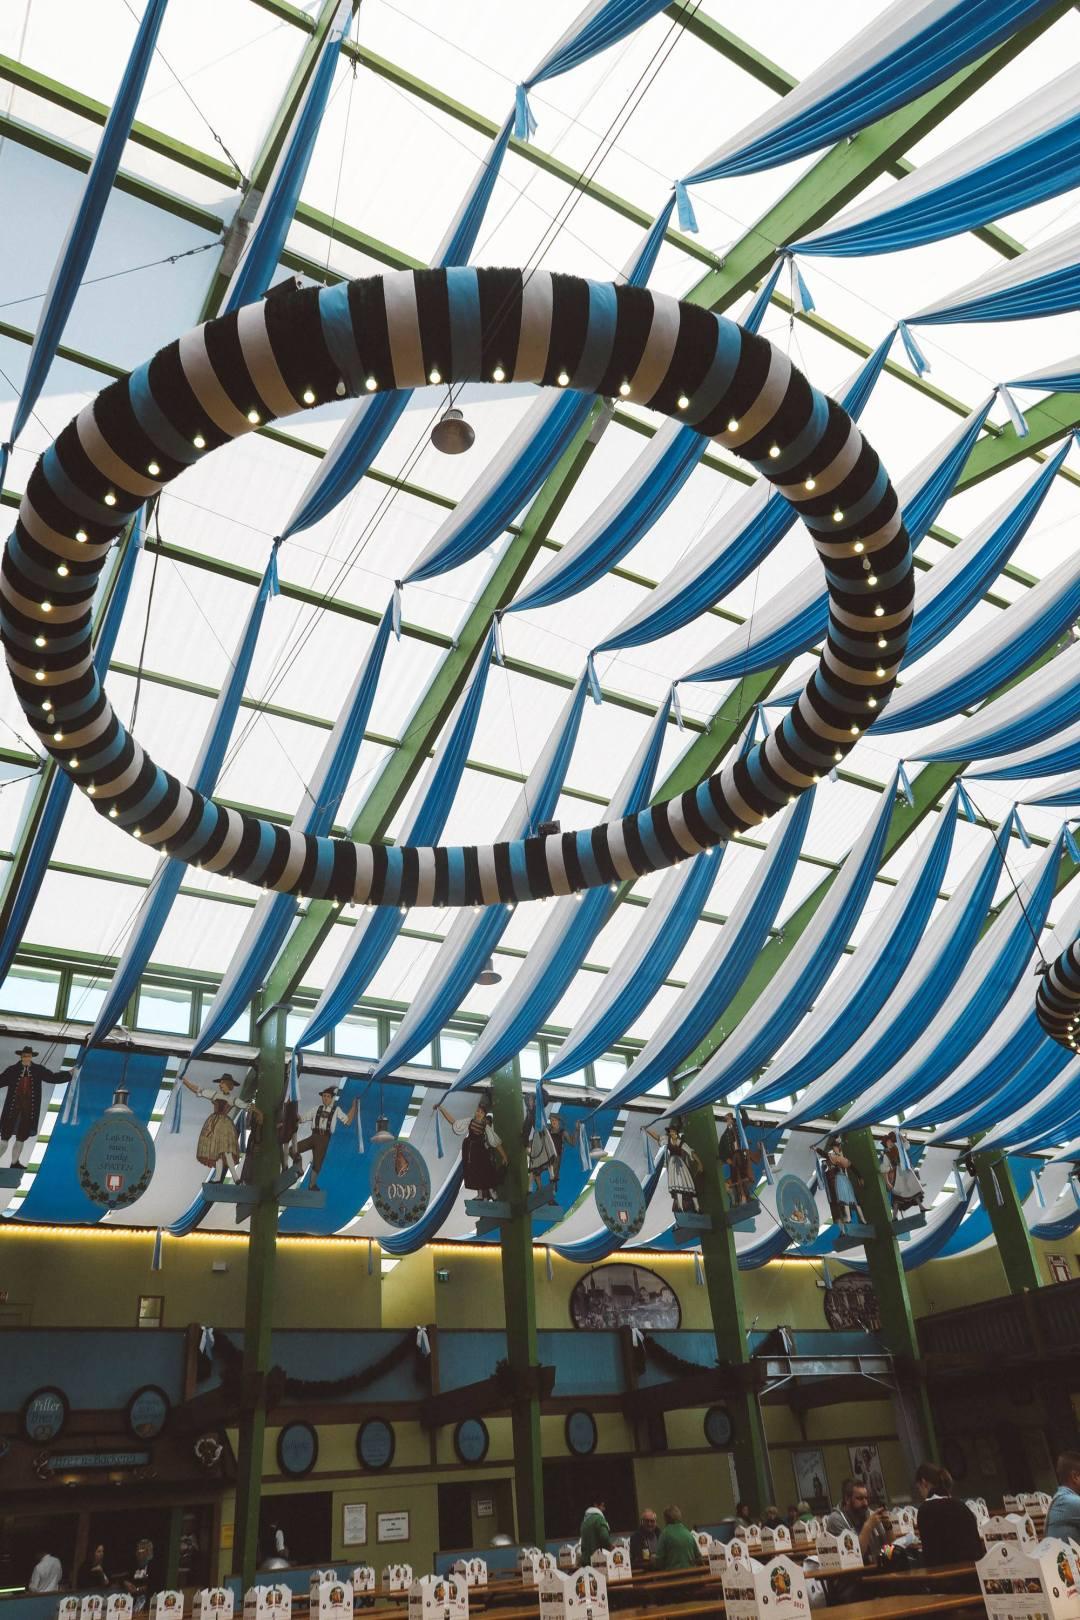 Oktoberfest Munich spaten tent inside